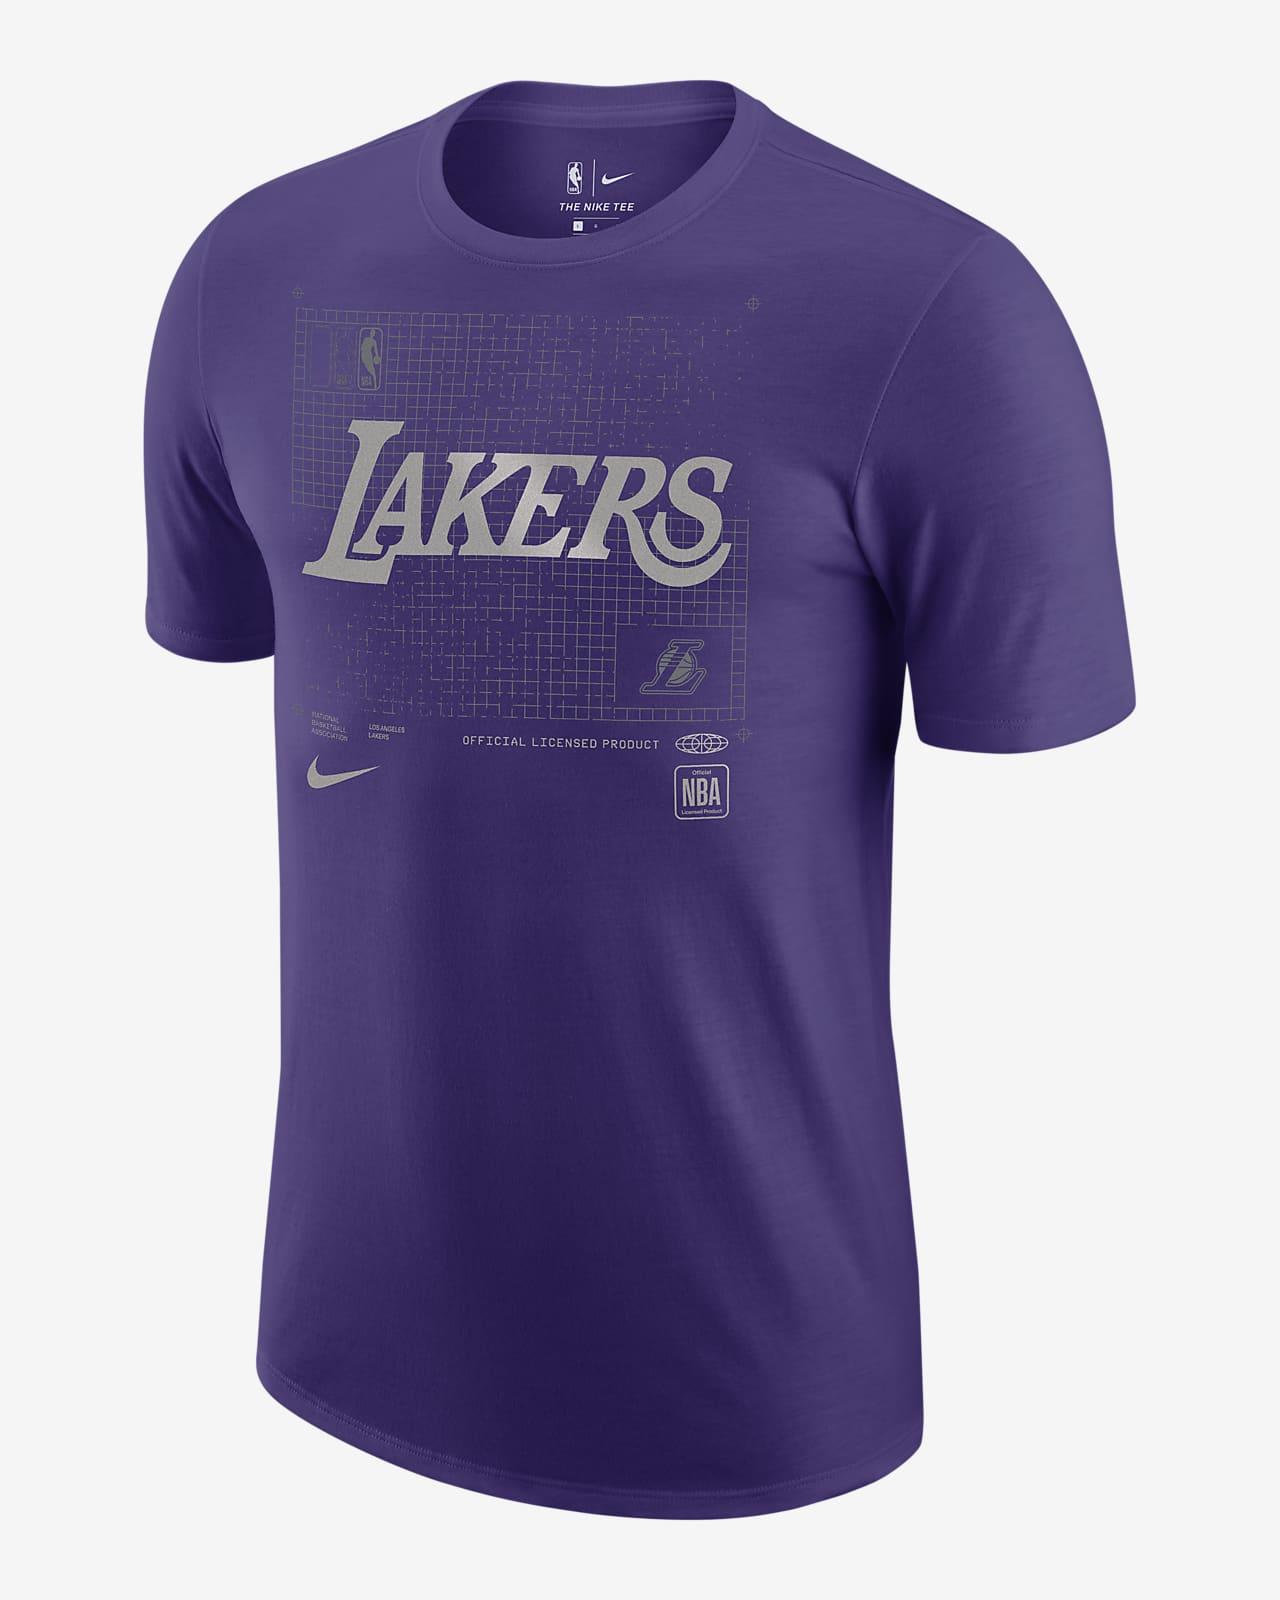 Los Angeles Lakers Courtside Chrome Men's Nike NBA T-Shirt